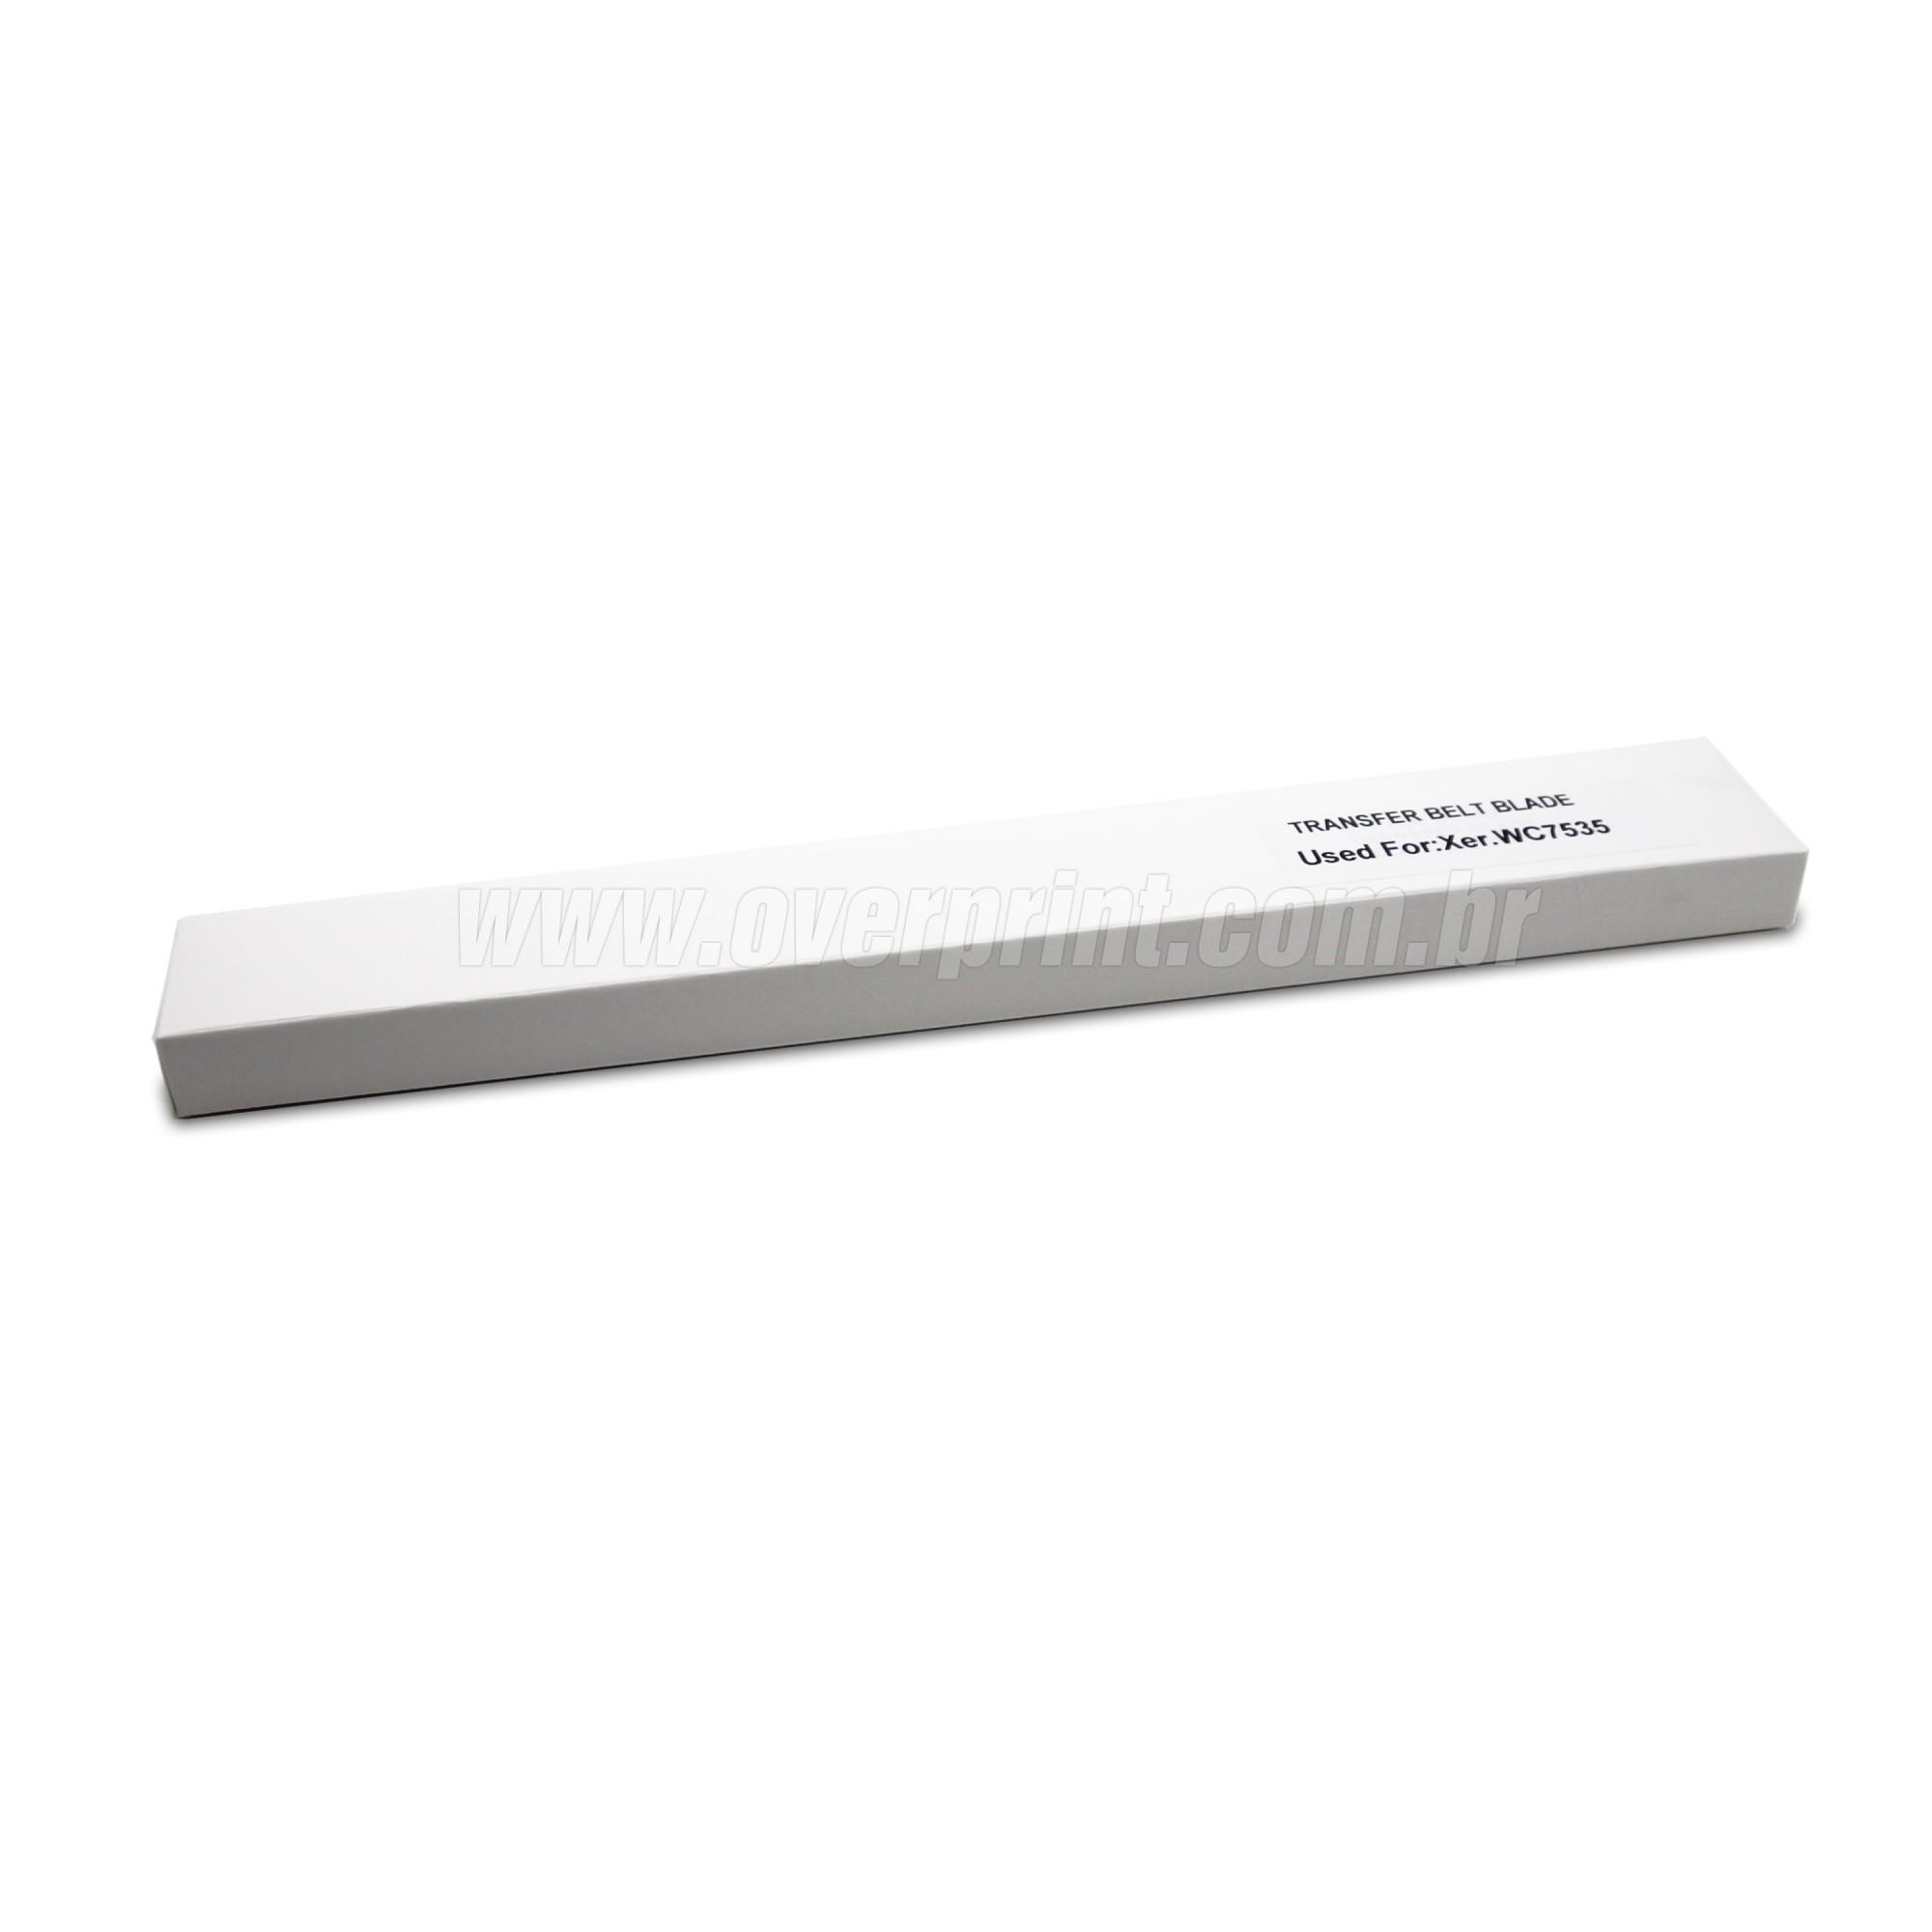 Lâmina de Limpeza da Belt Xerox Phaser 7500 - Overprint